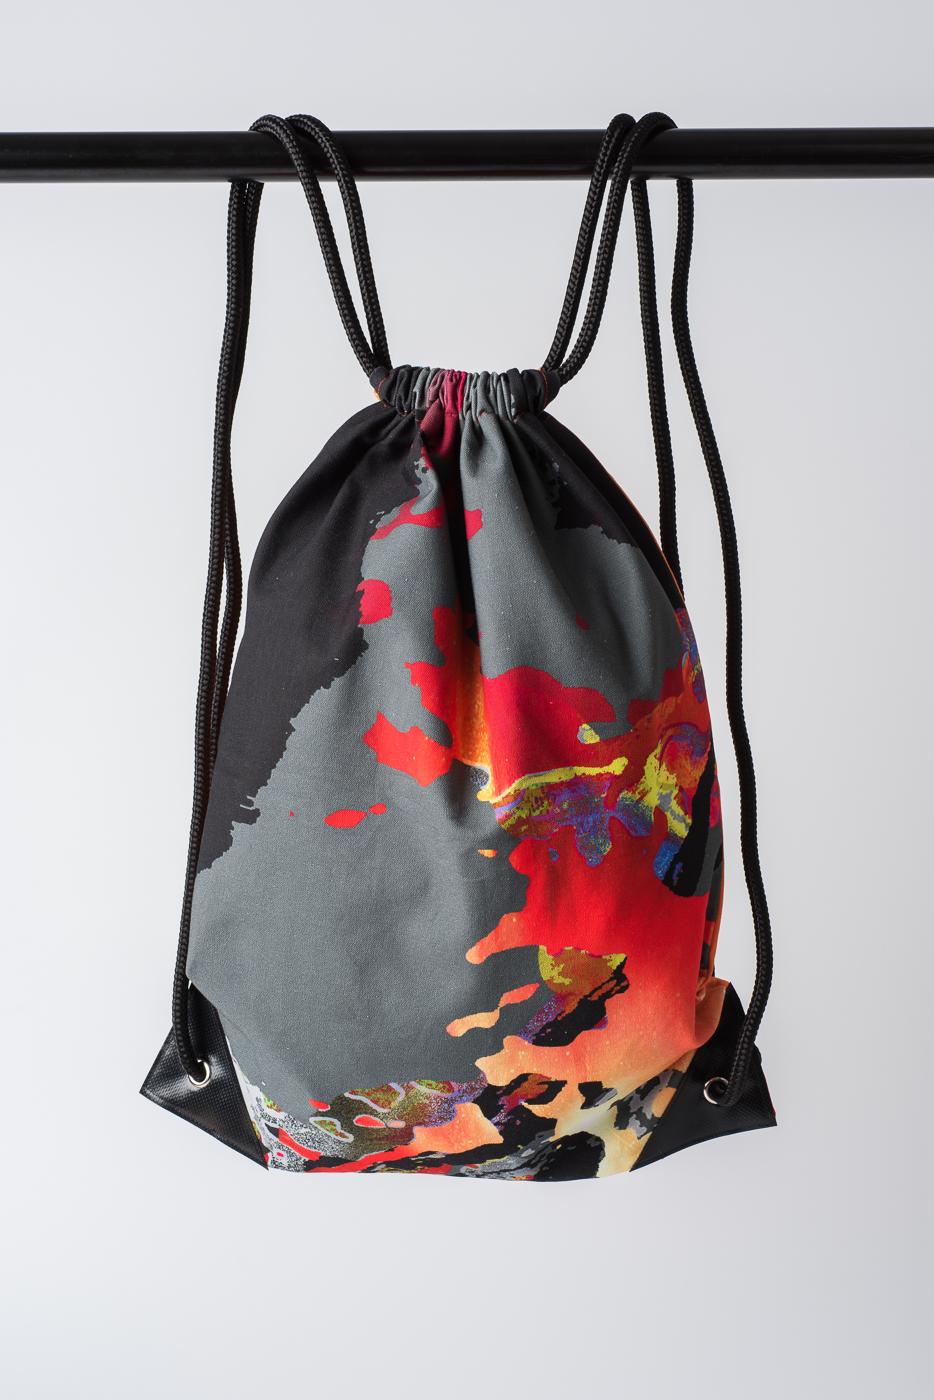 Phoenix Bags